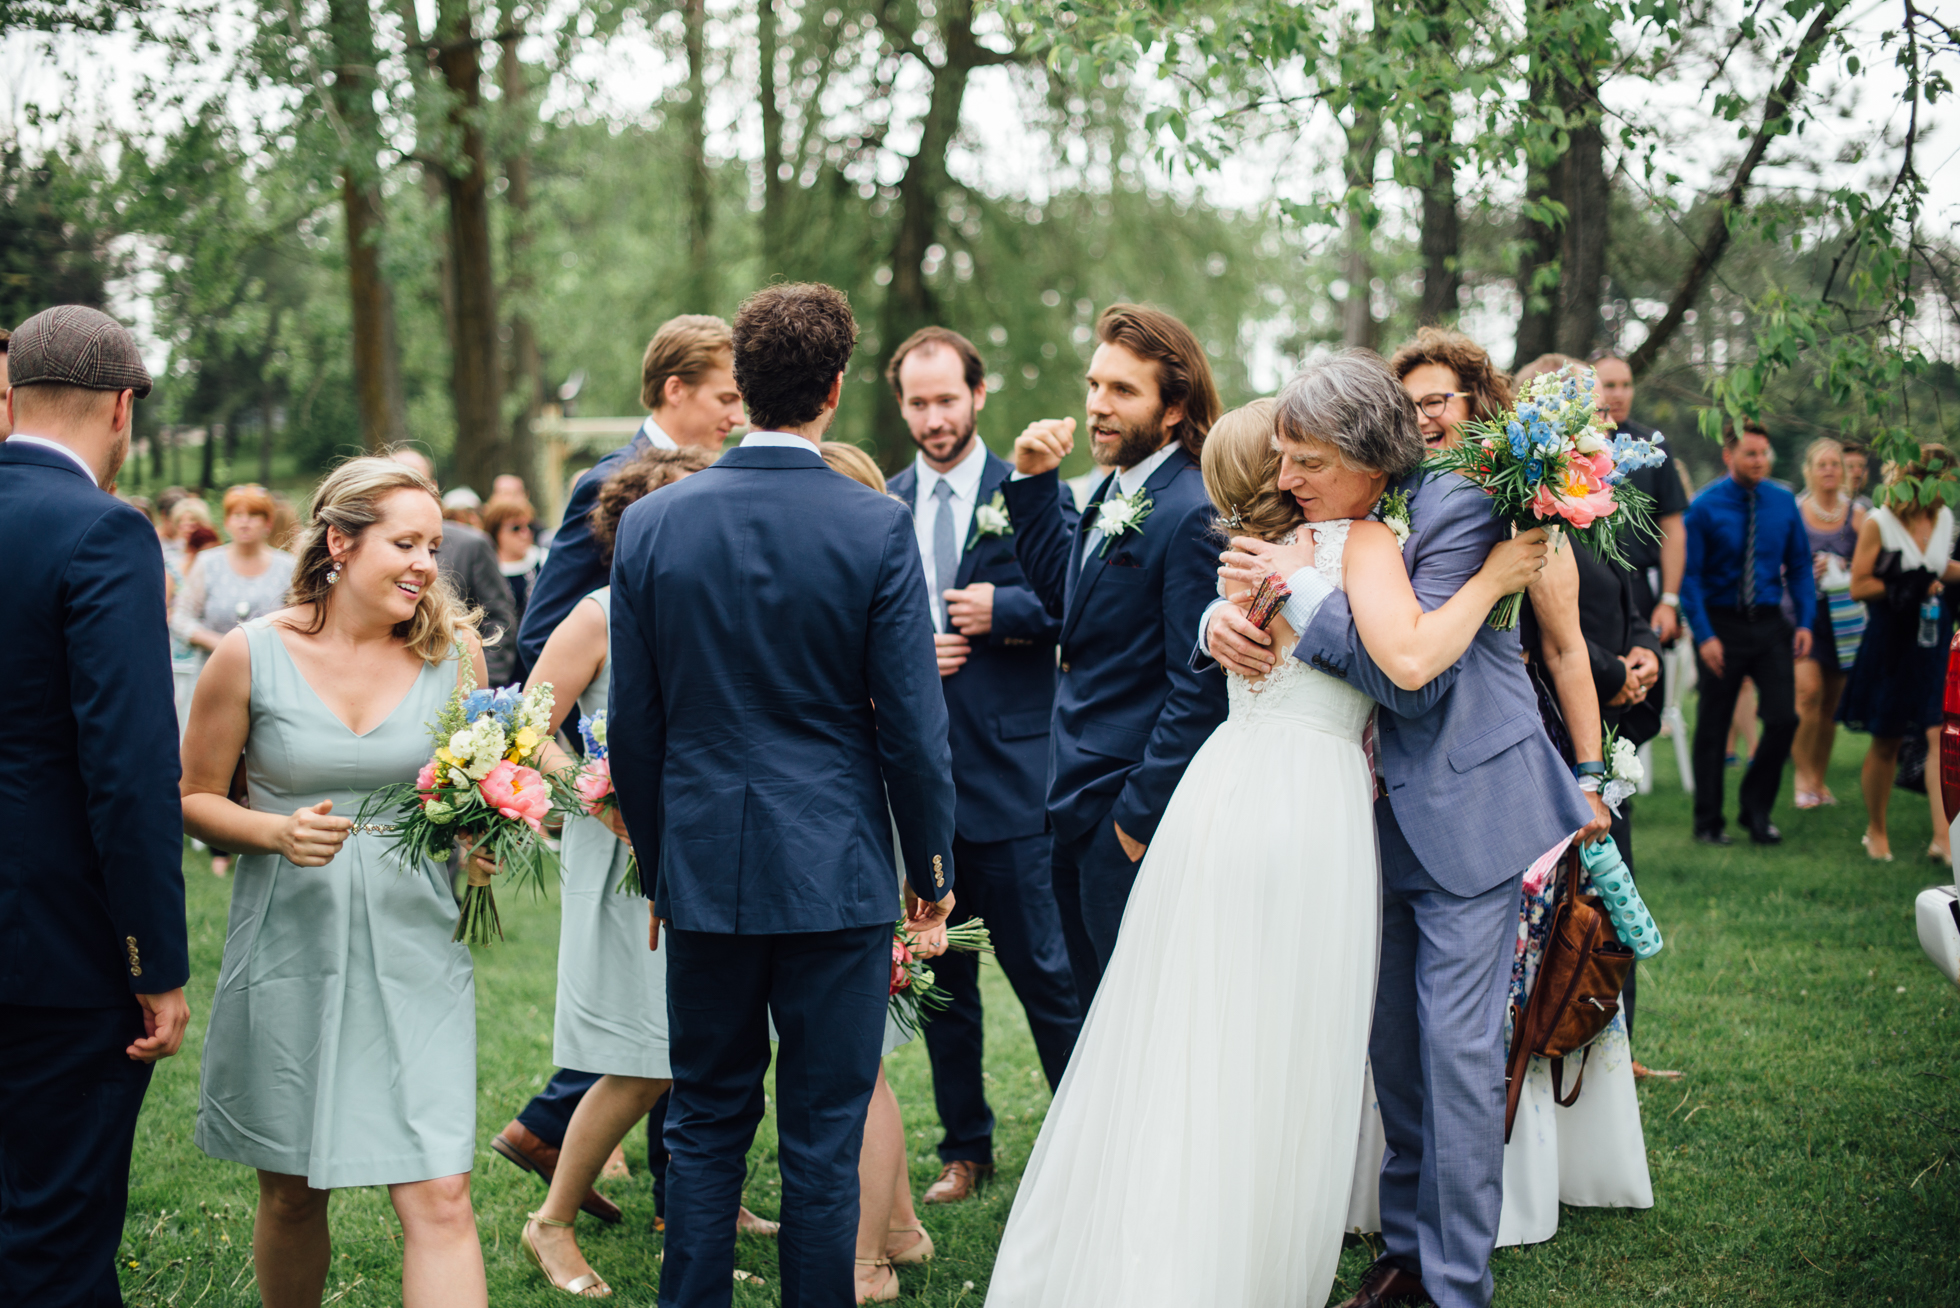 Outdoor-Caledon-Tralee-Wedding-Photography-67